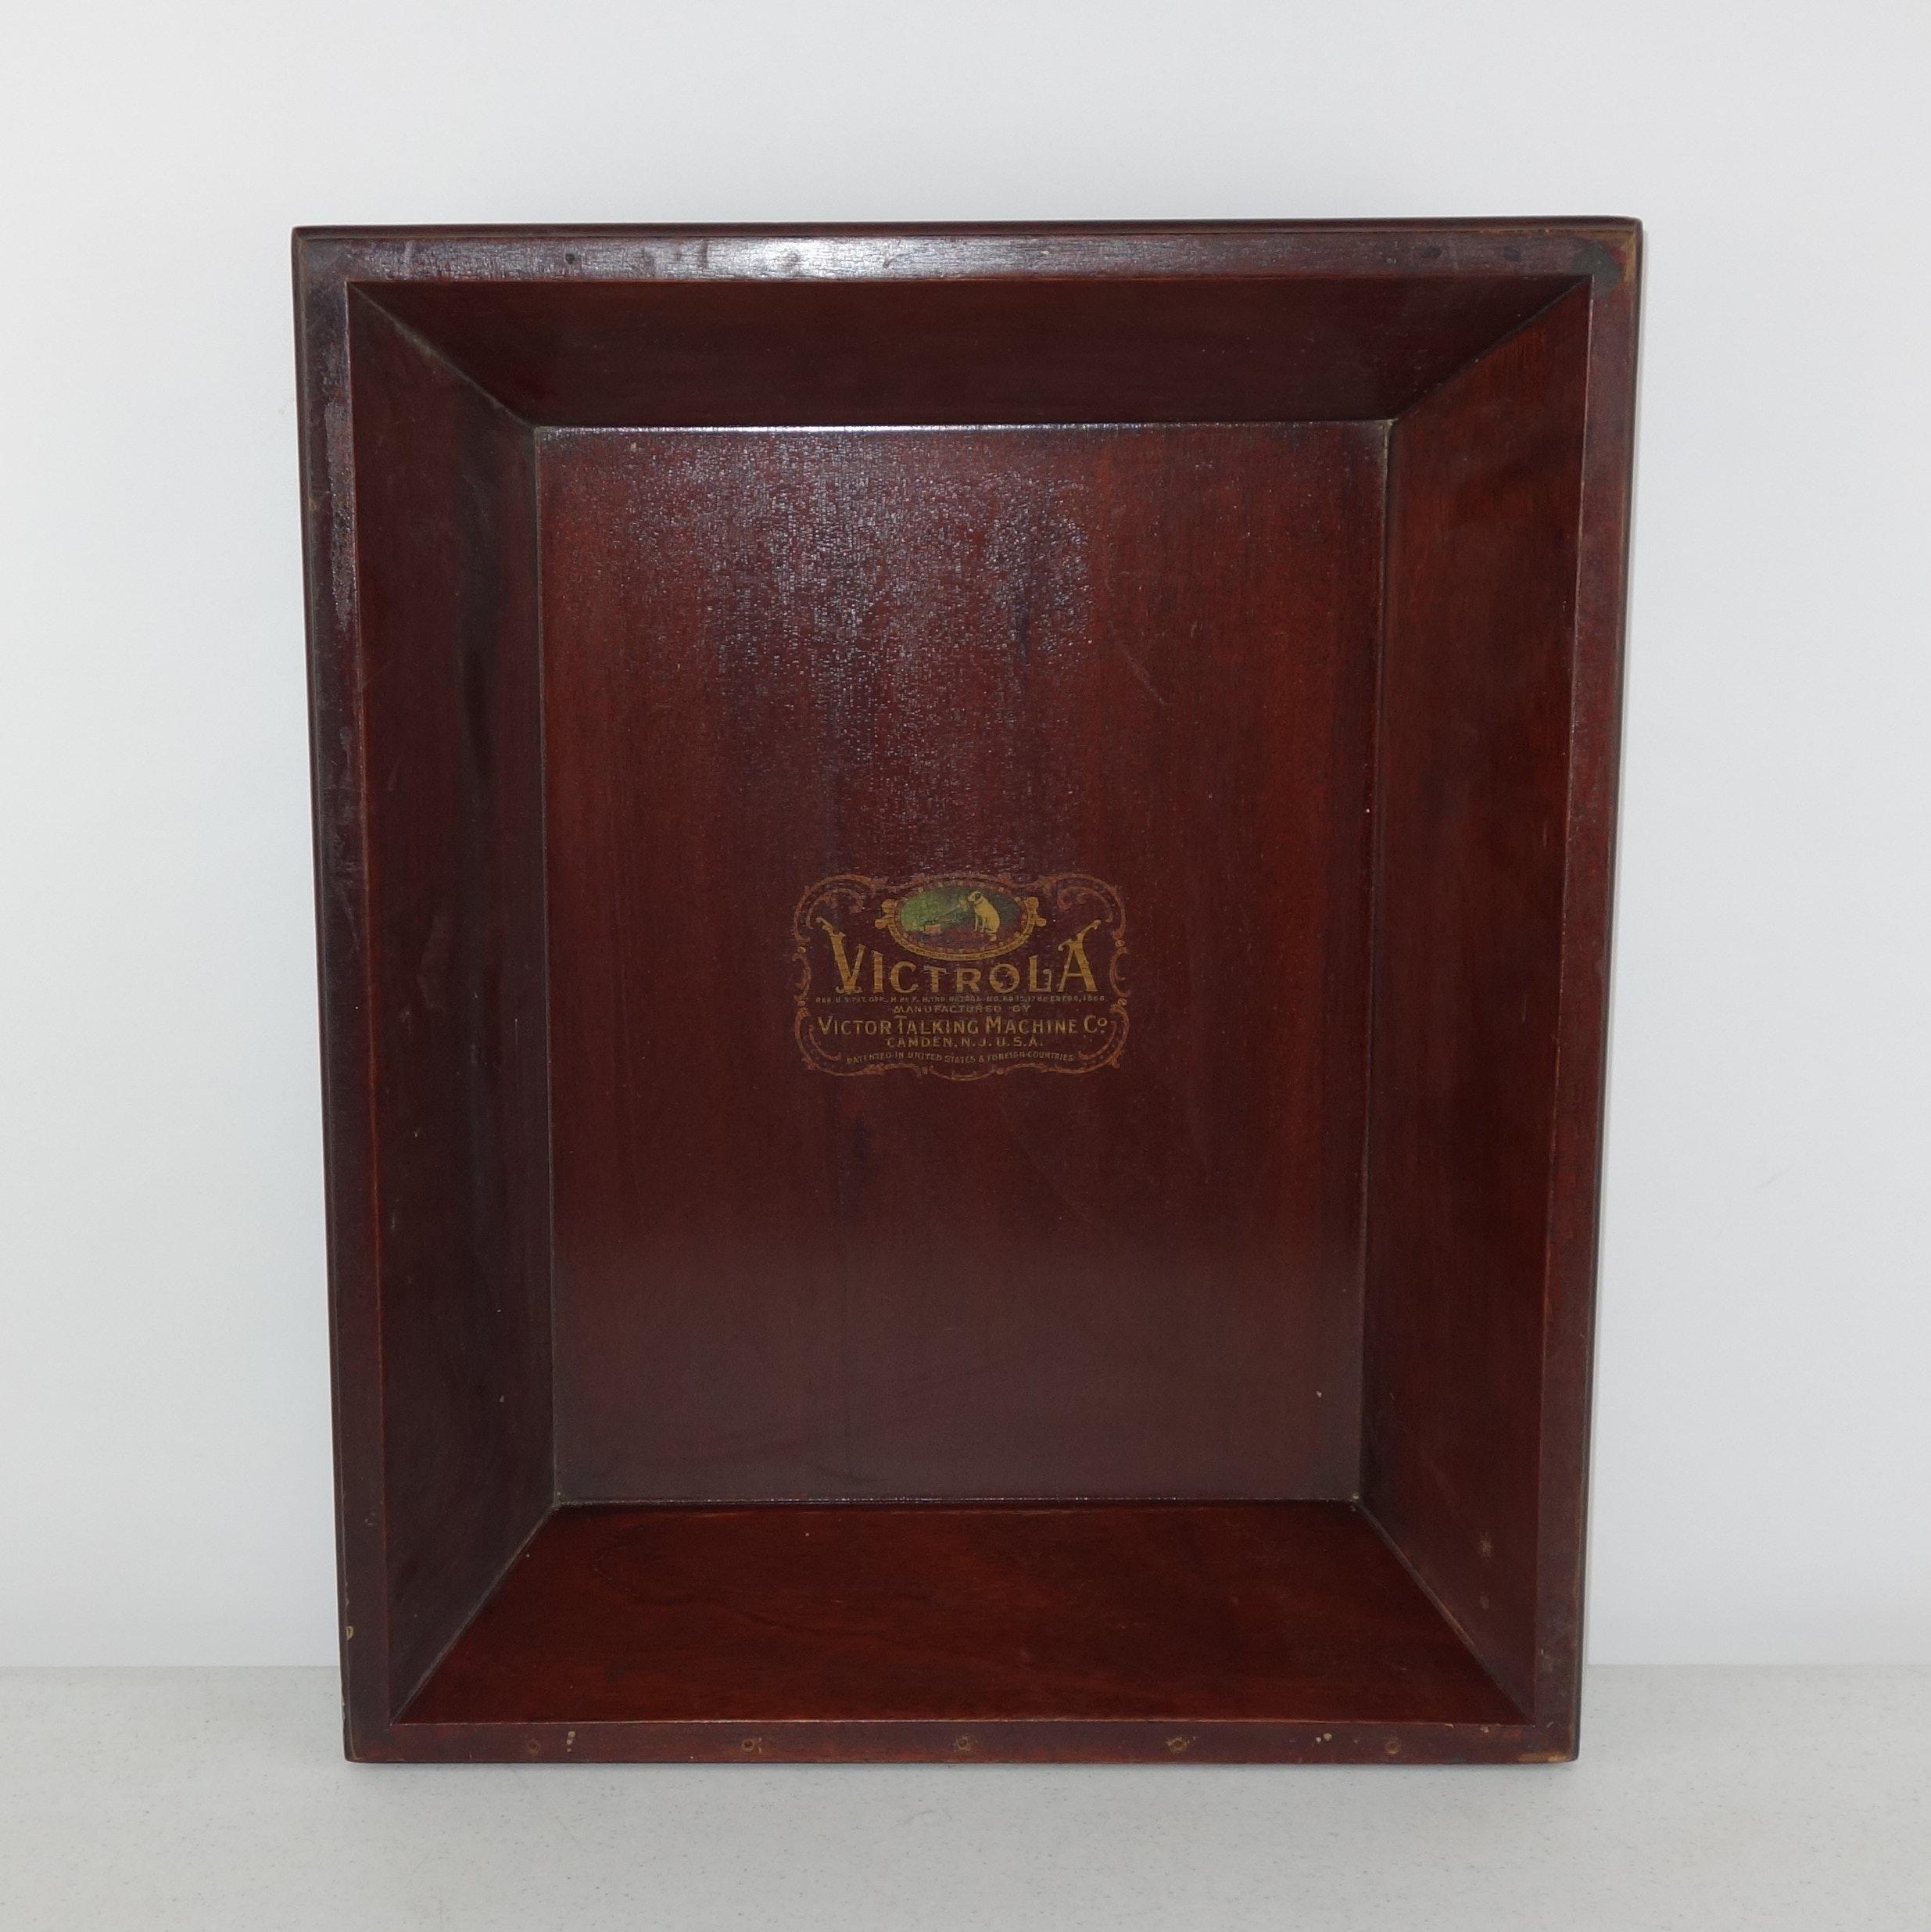 Vintage Victrola Wooden Tray